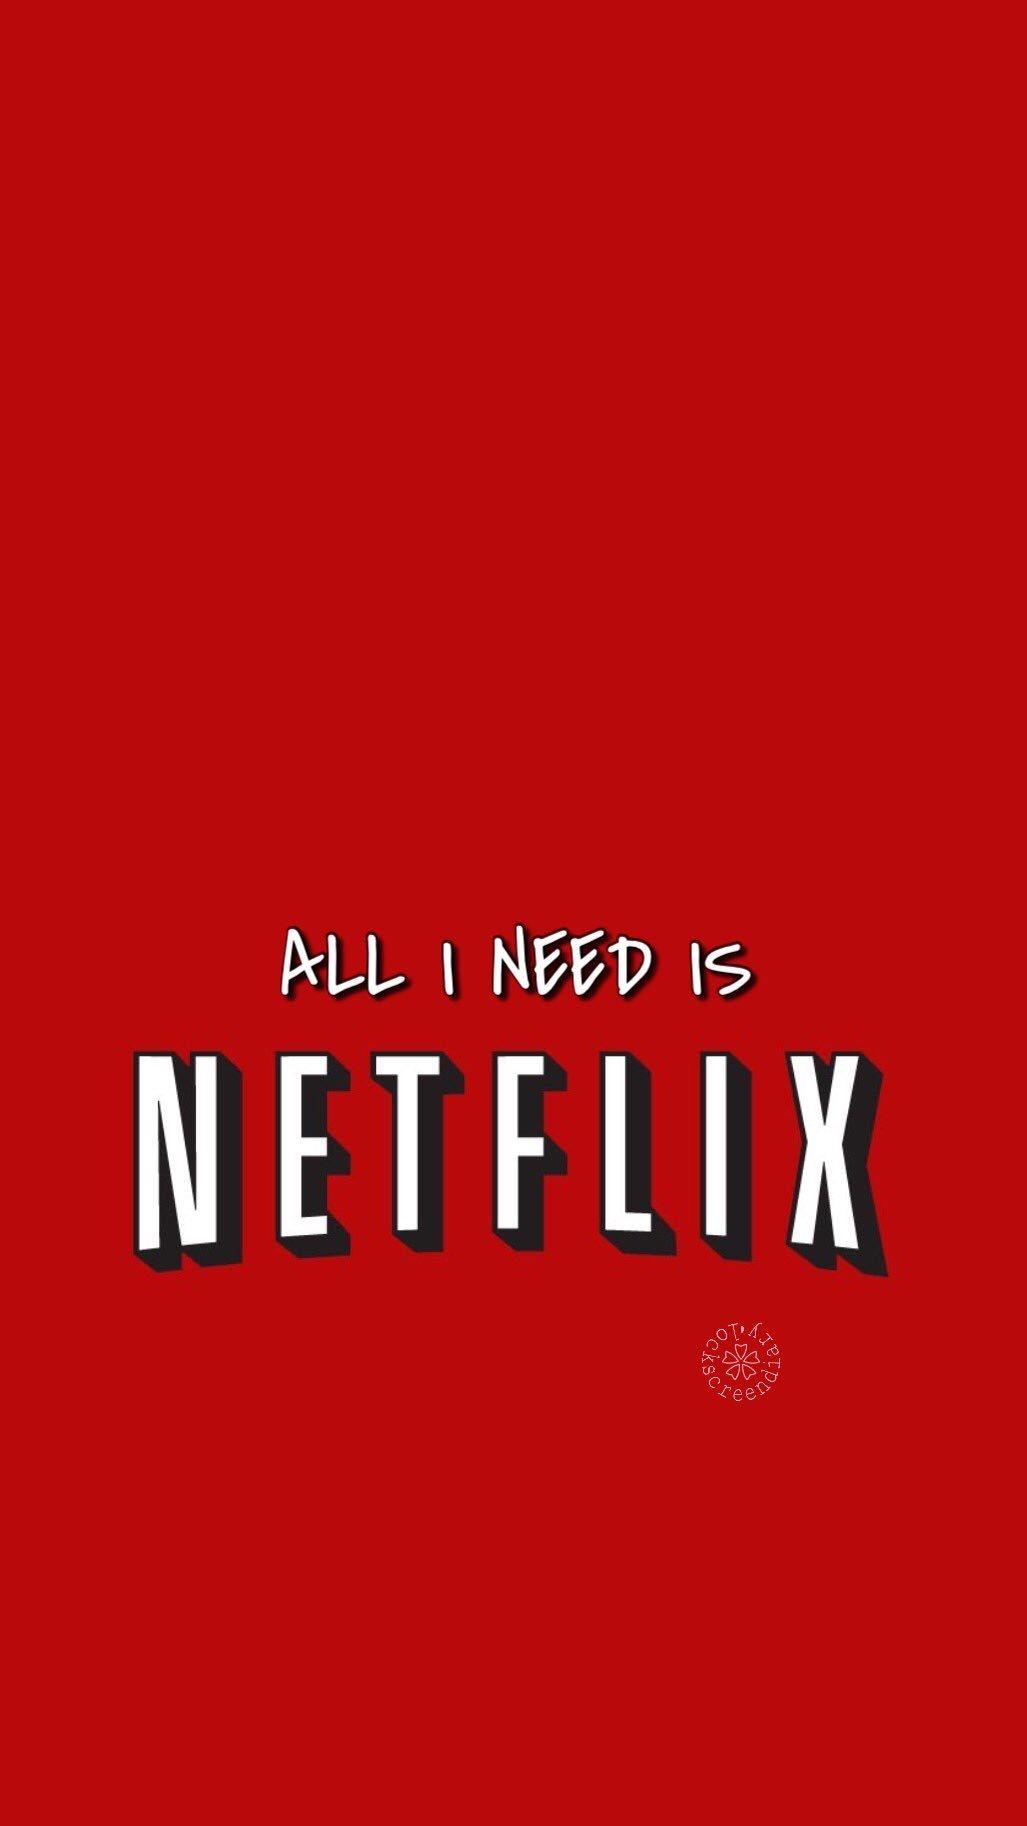 Unduh 86 Wallpaper Tumblr Netflix HD Terbaik